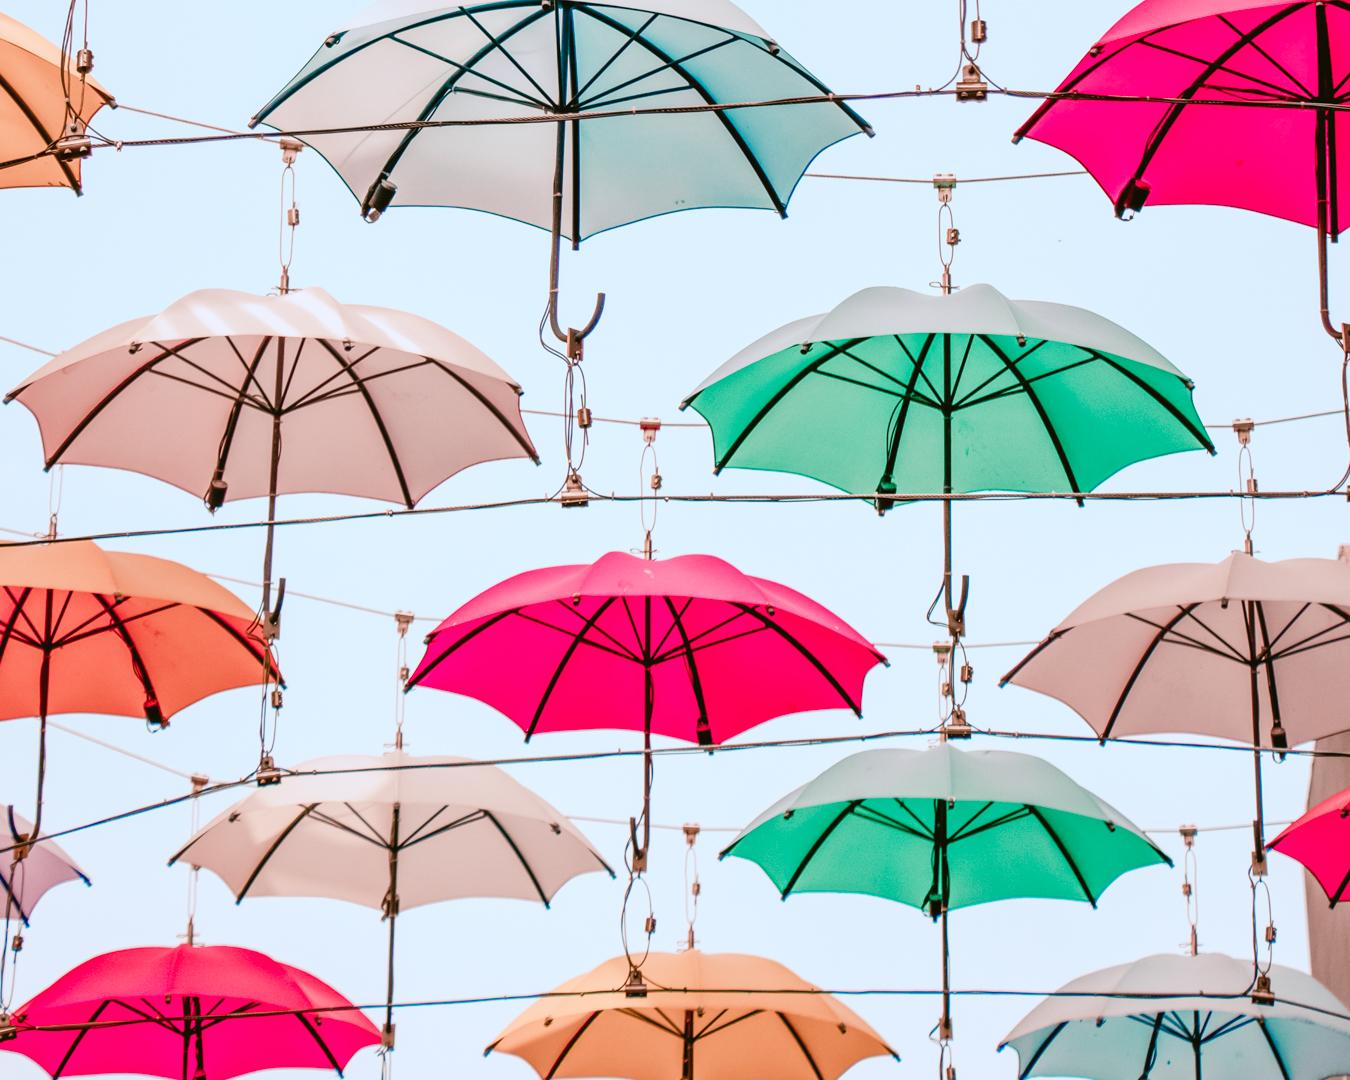 Instagrammable umbrellas at Annes Lane Dental in Dublin